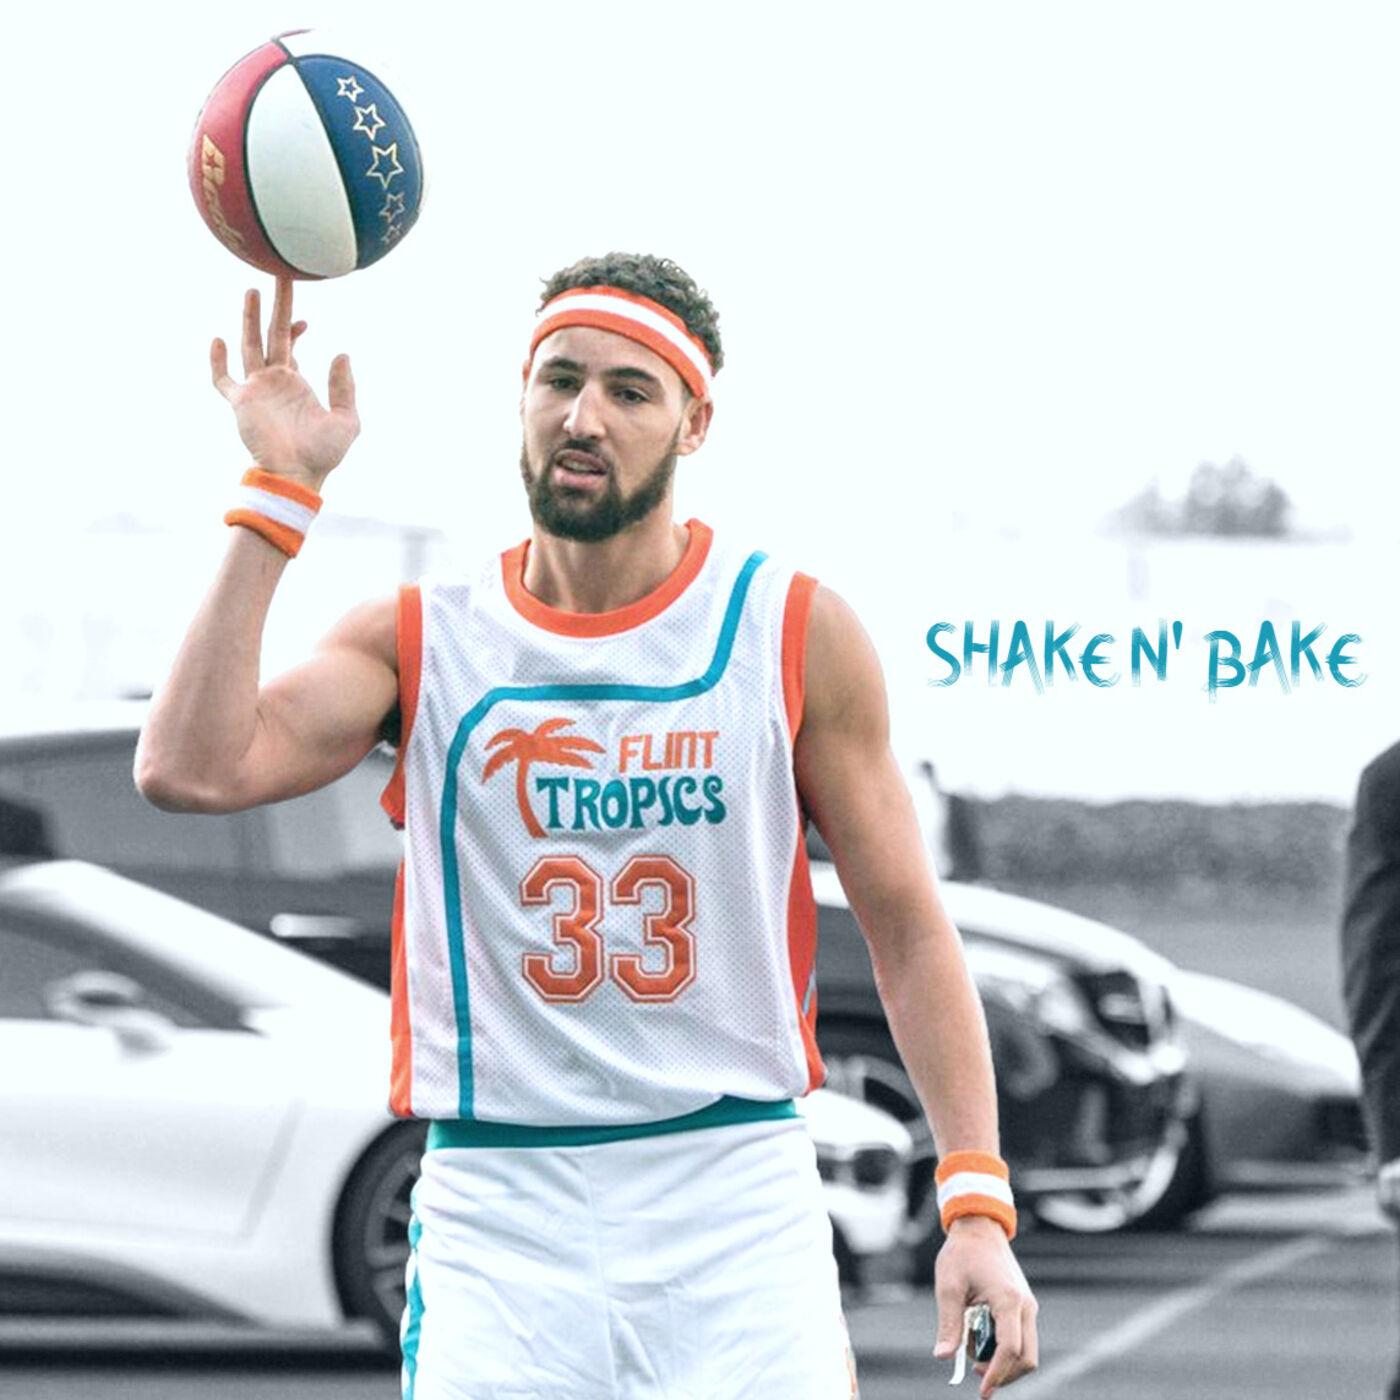 Shake n' Bake: S05E16 - If NBA players were movie/series characters